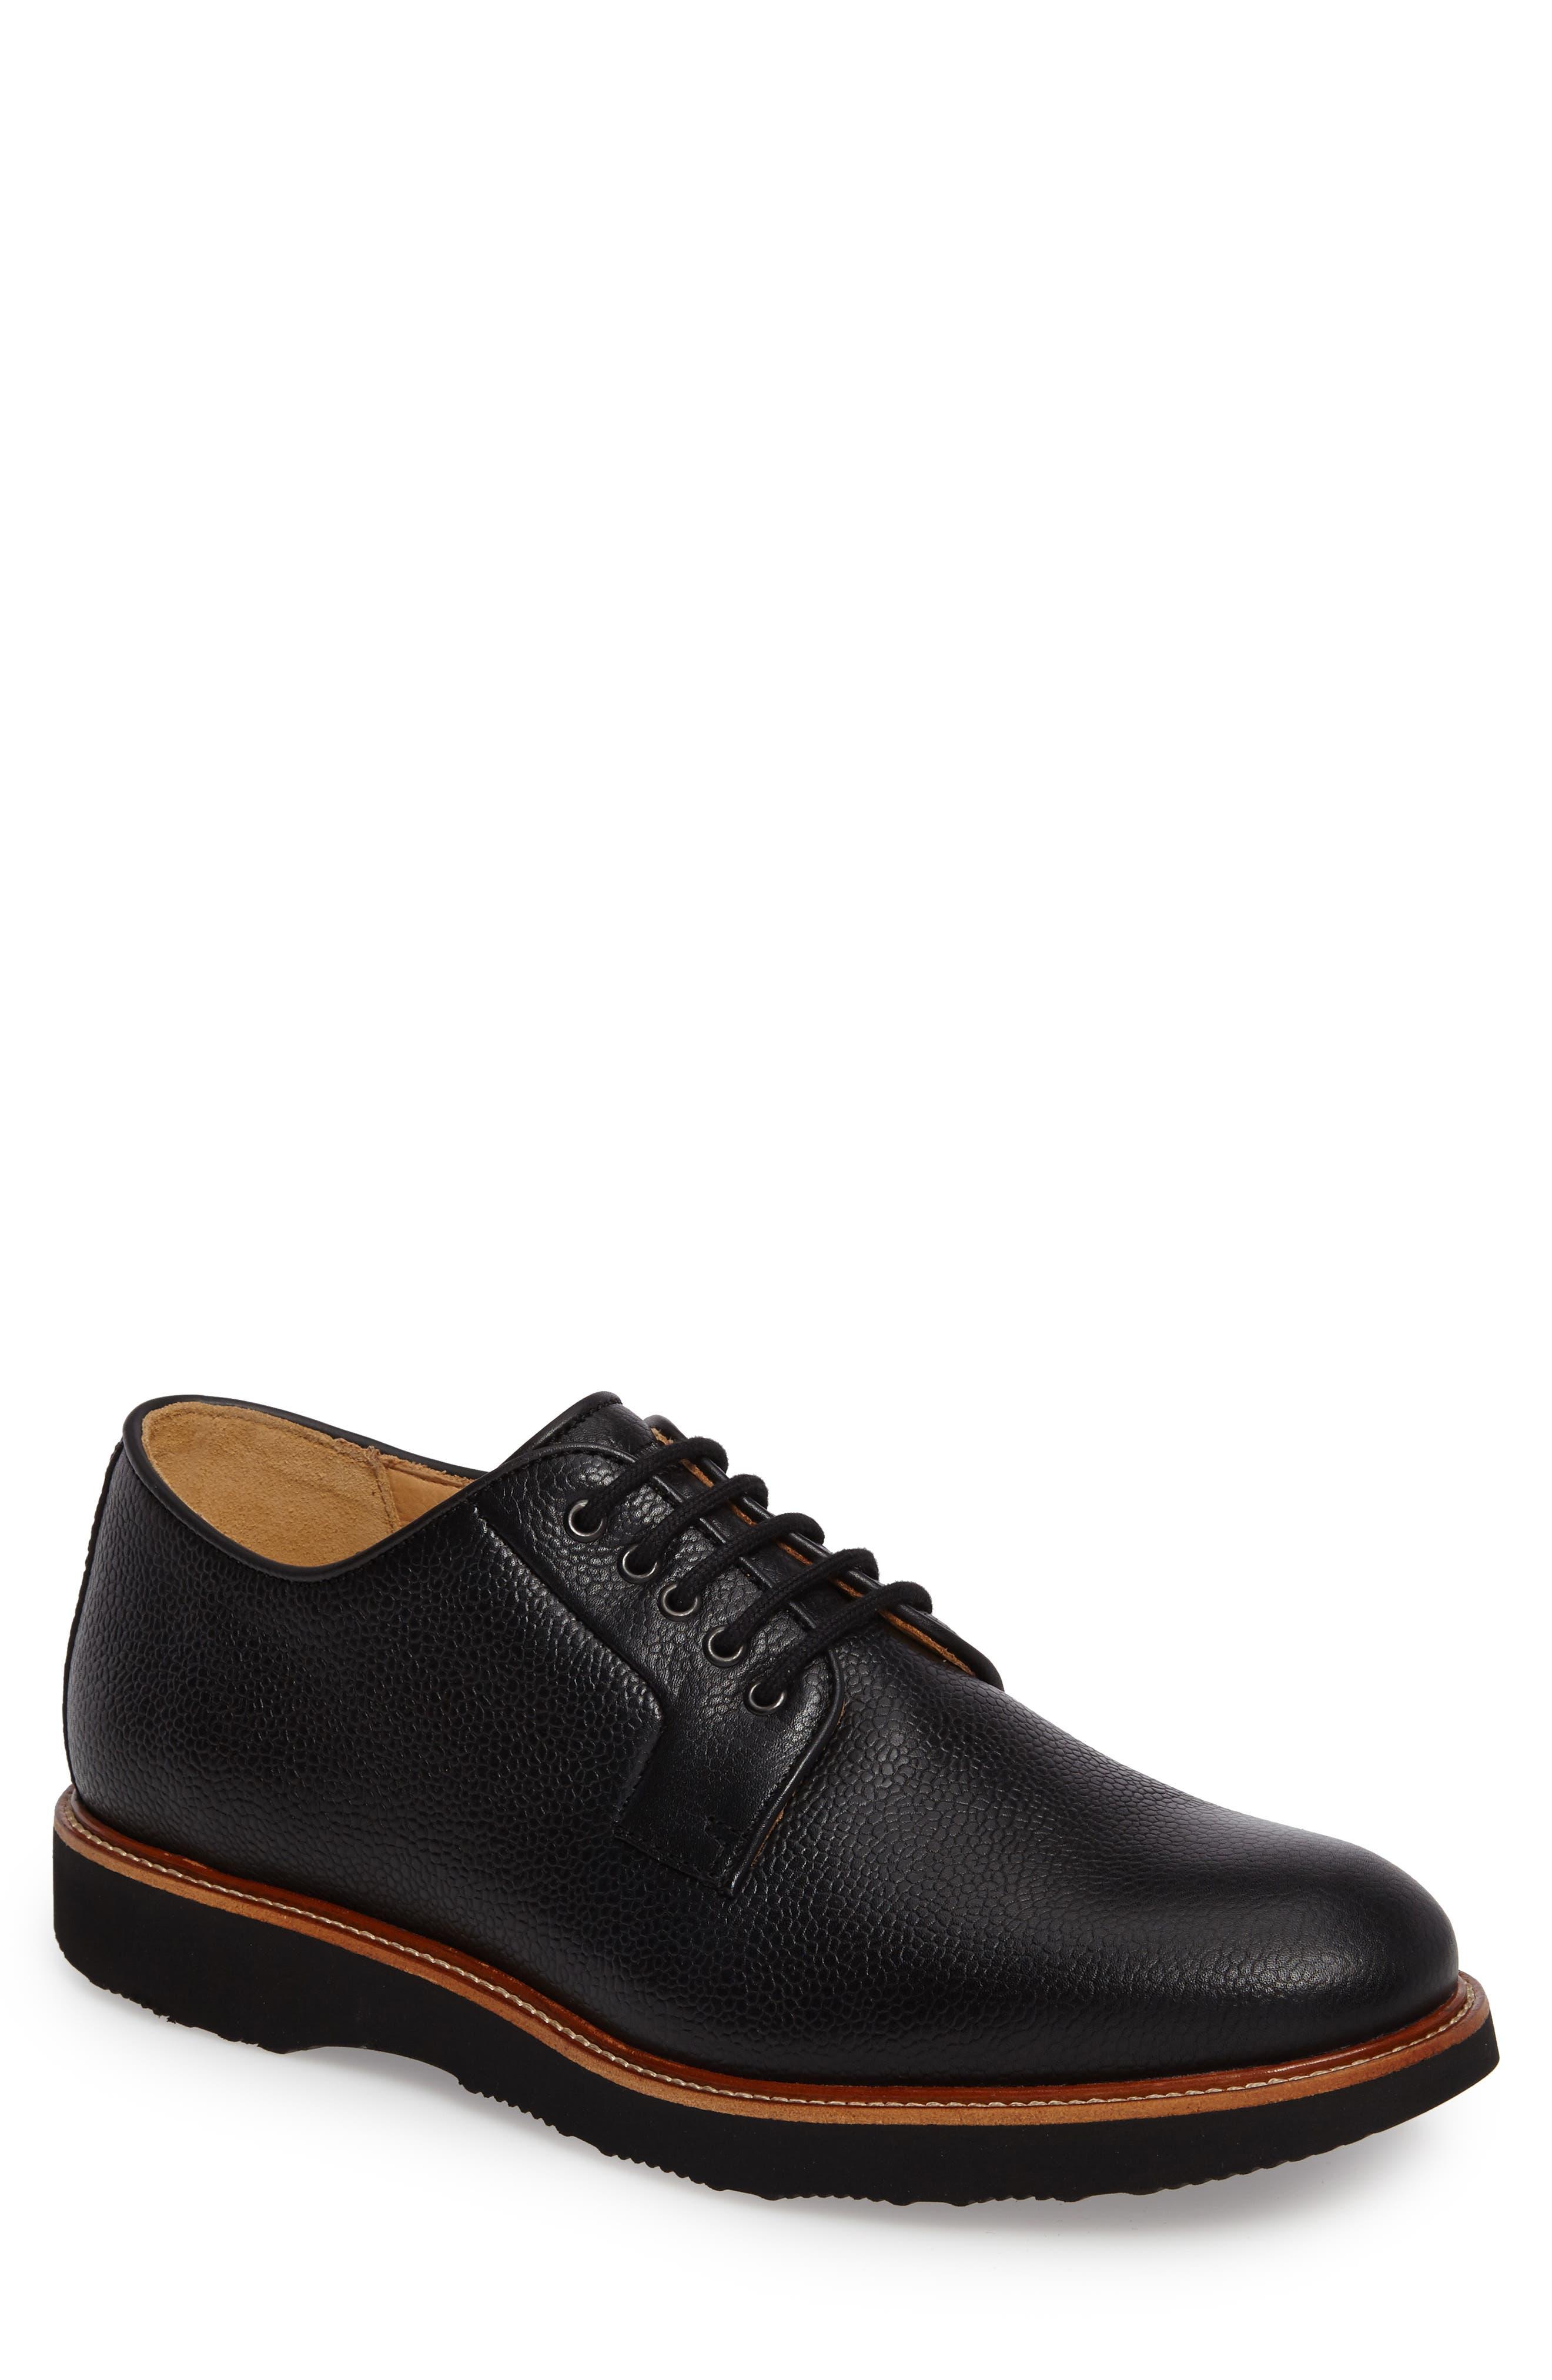 SAMUEL HUBBARD Highlander Plain Toe Derby, Main, color, BLACK PEBBLE GRAIN